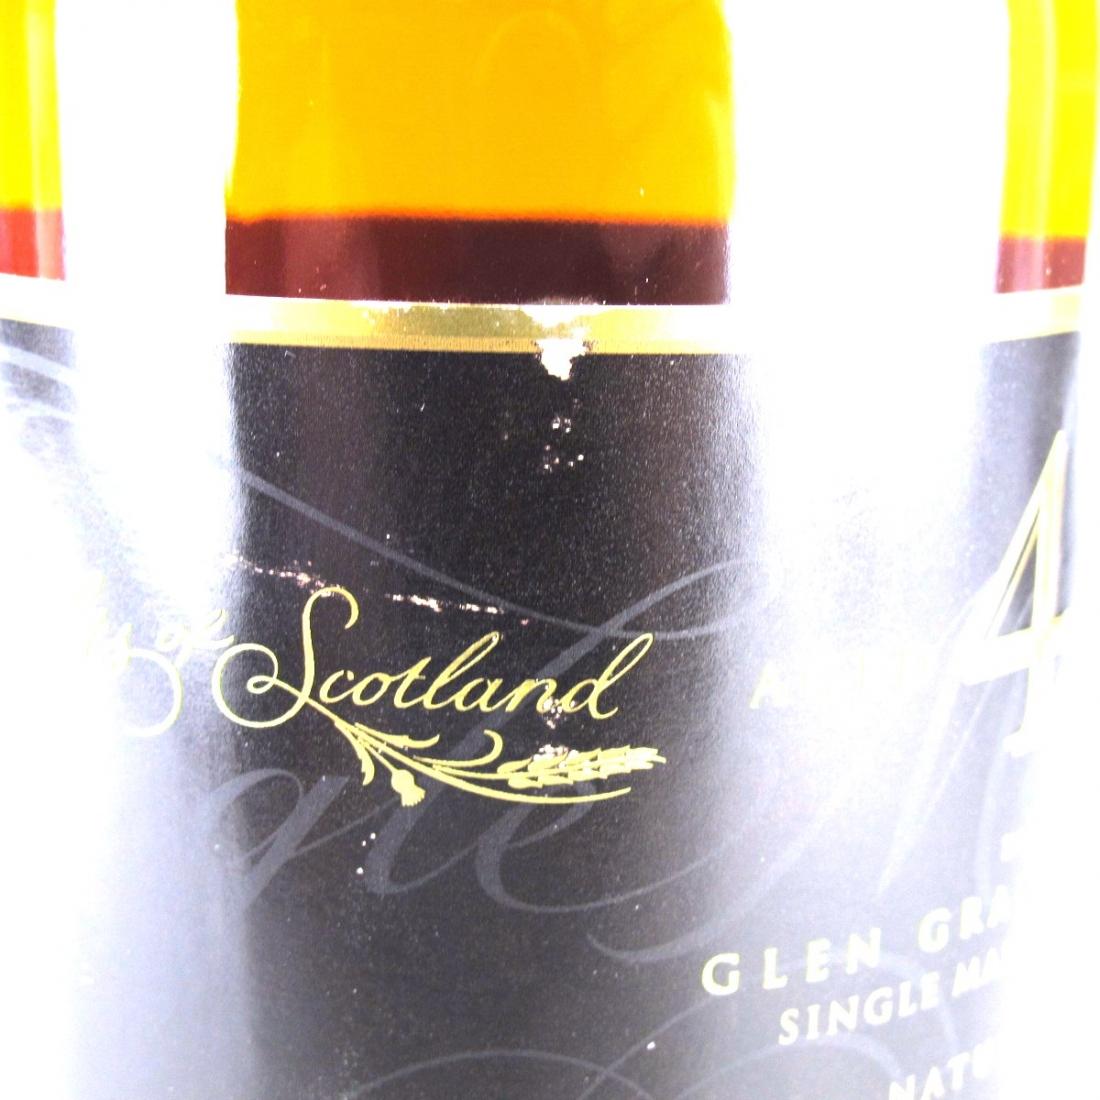 Glen Grant 45 Year Old Single Malts of Scotland